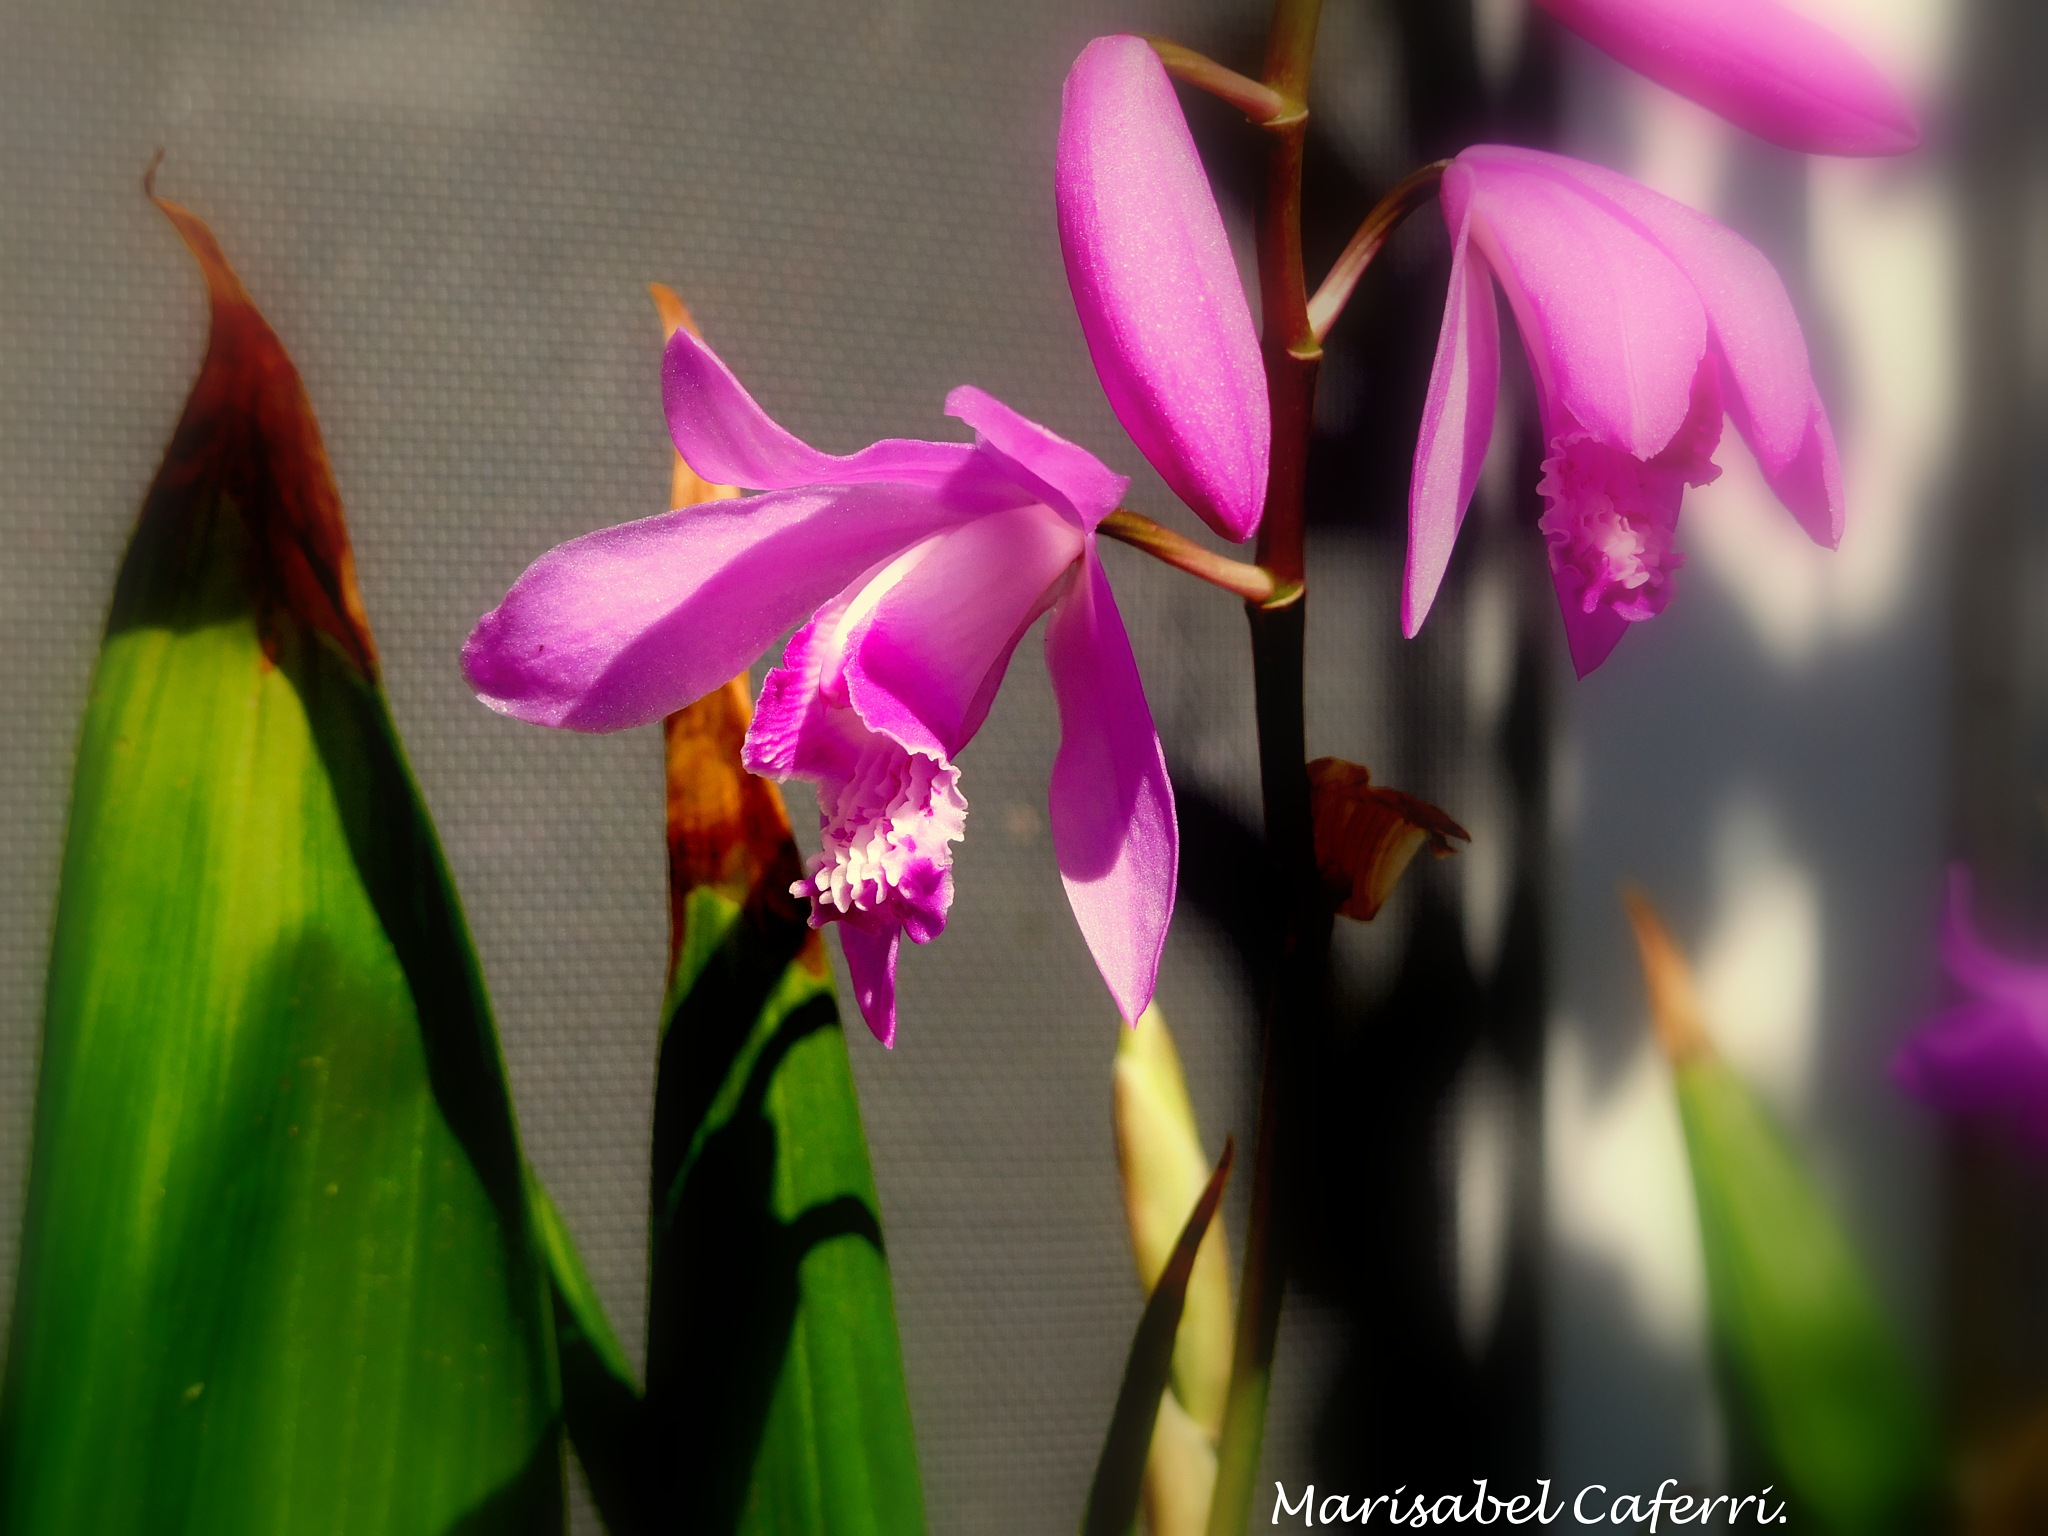 Orquideas terrestres. by marisabelcaferri